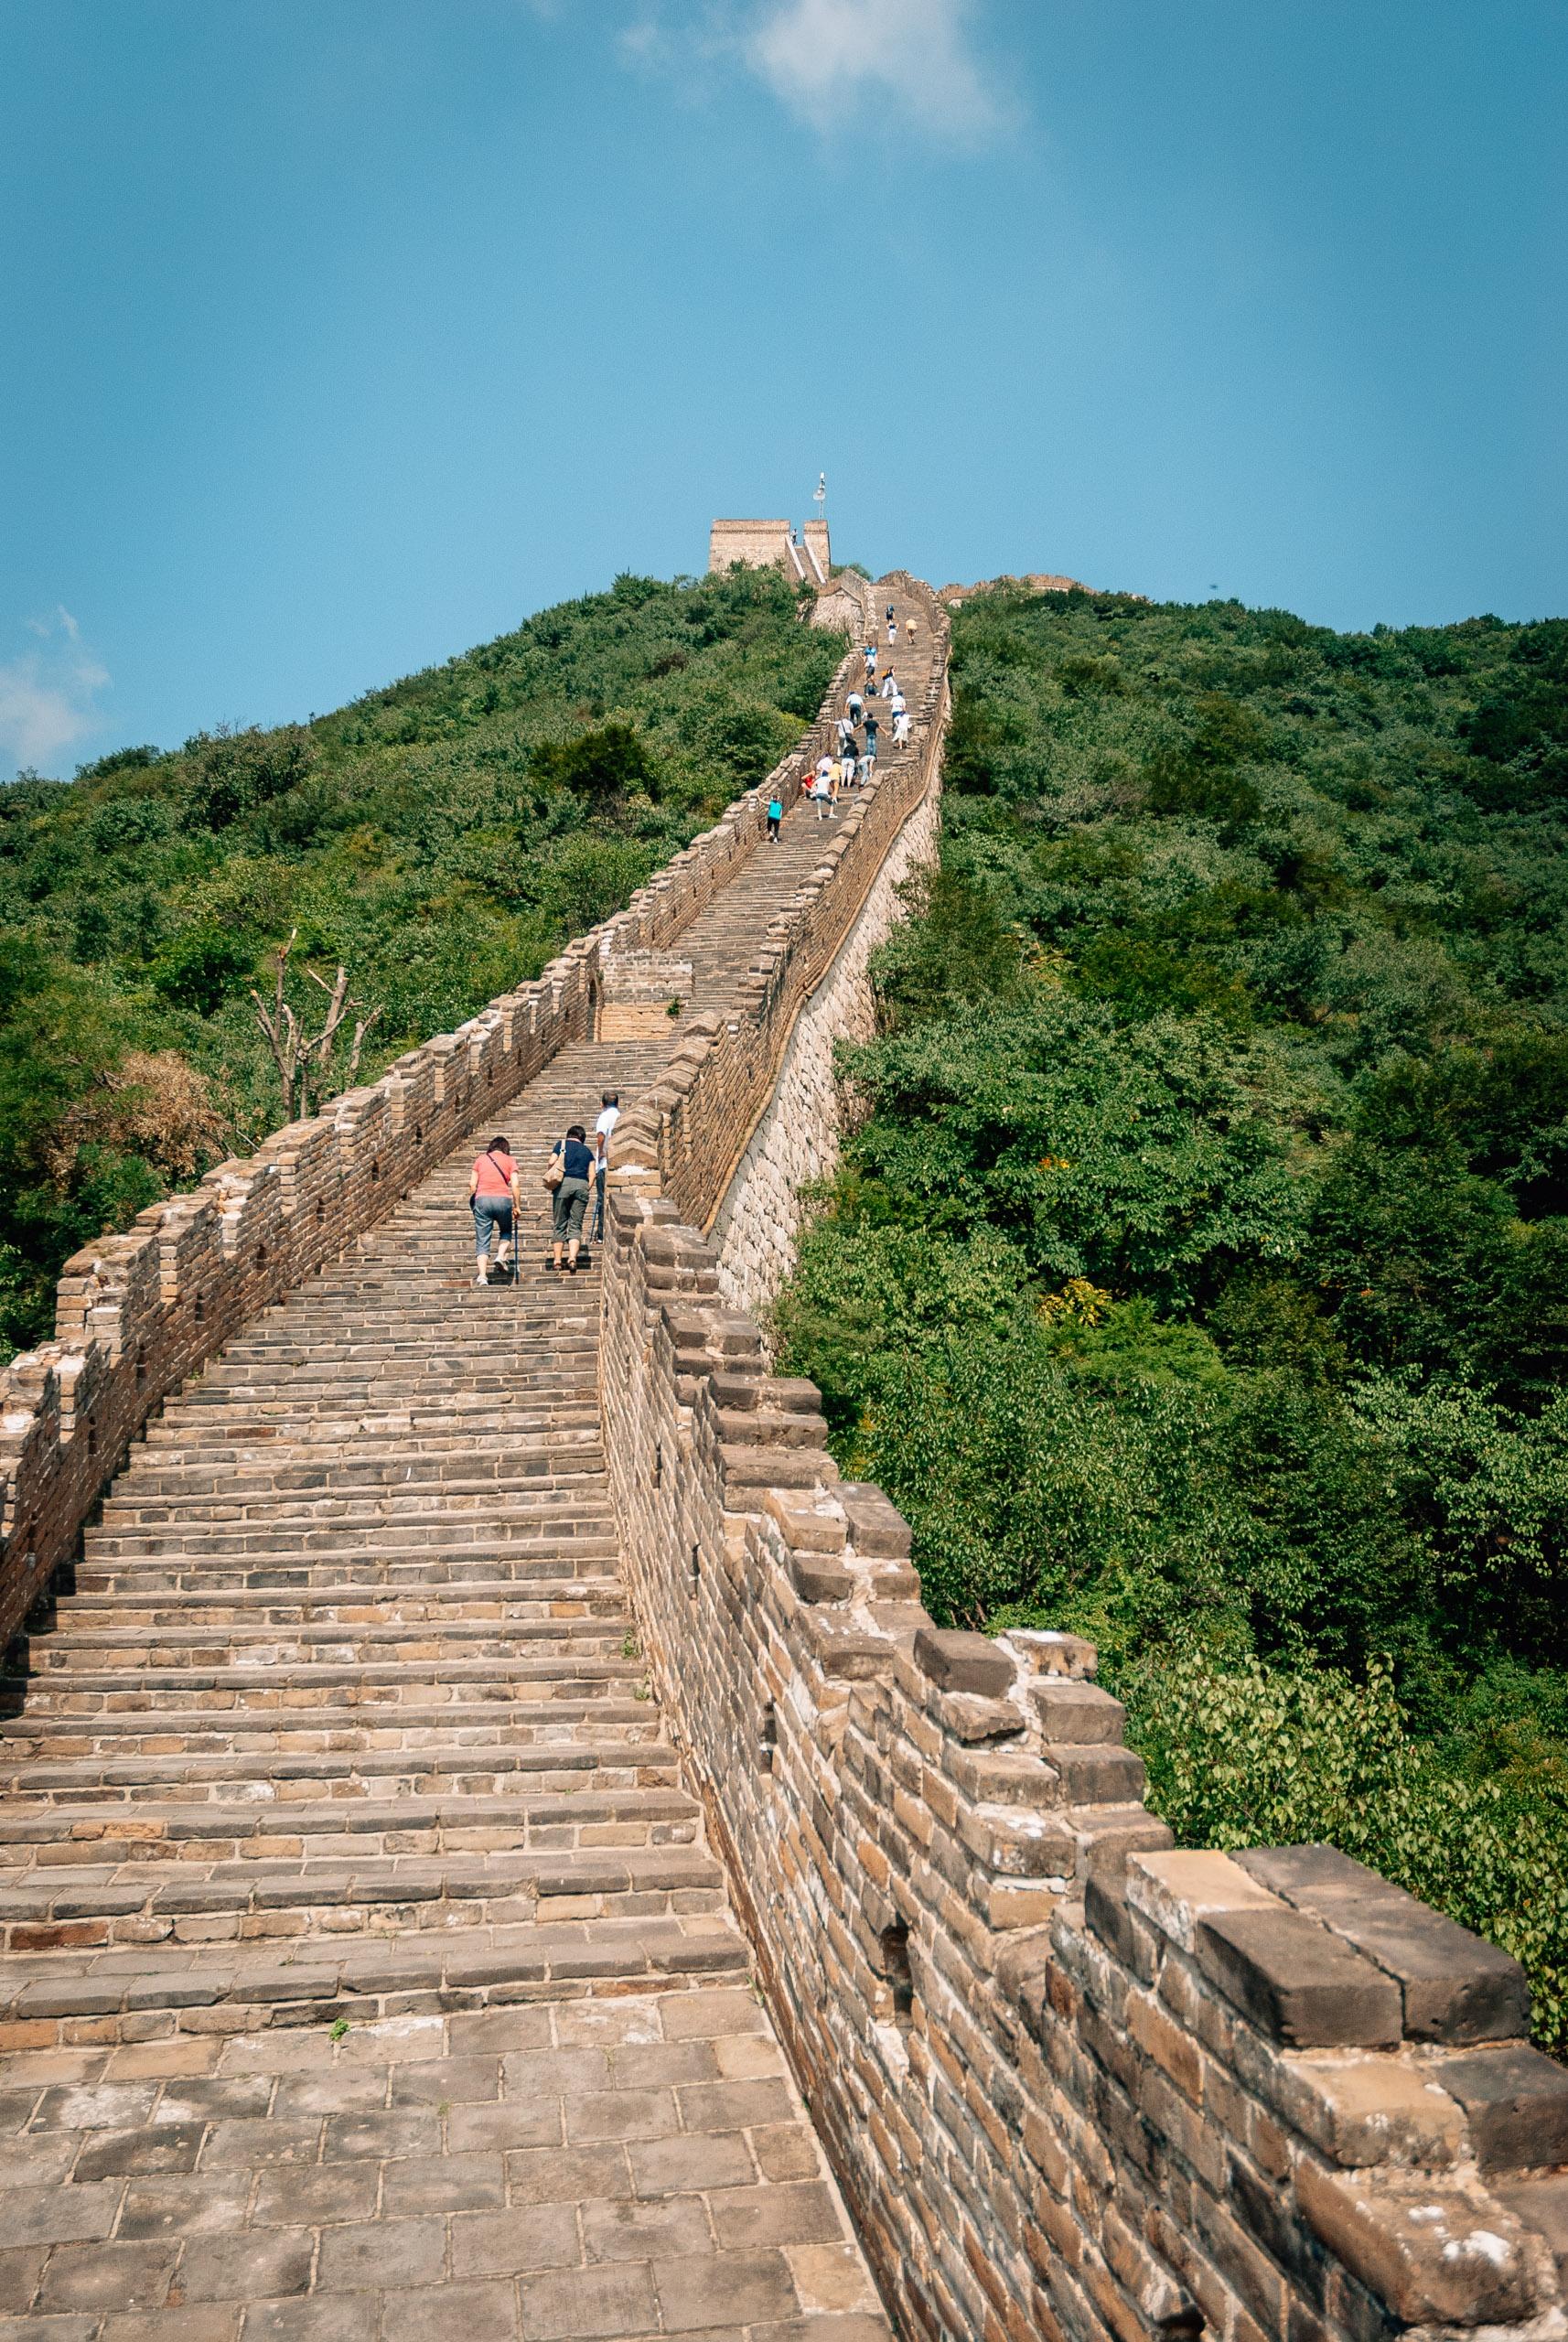 China - Beijing & The Great Wall - 2010-0902-DSC_0176_47744